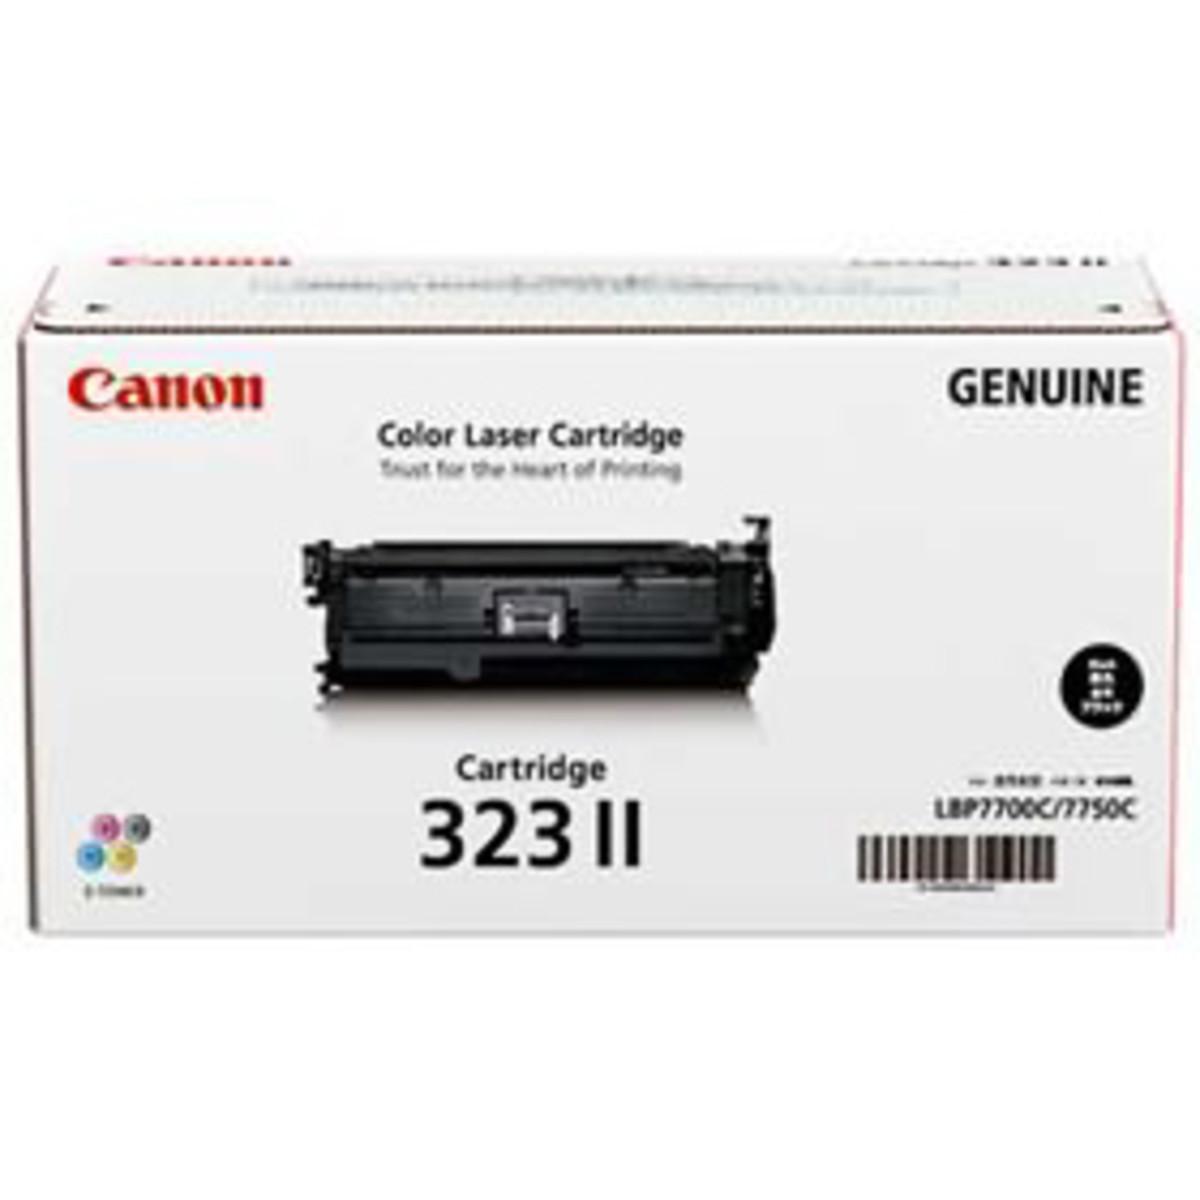 Canon CART-323BKII Black Toner Cartridge - High Yield